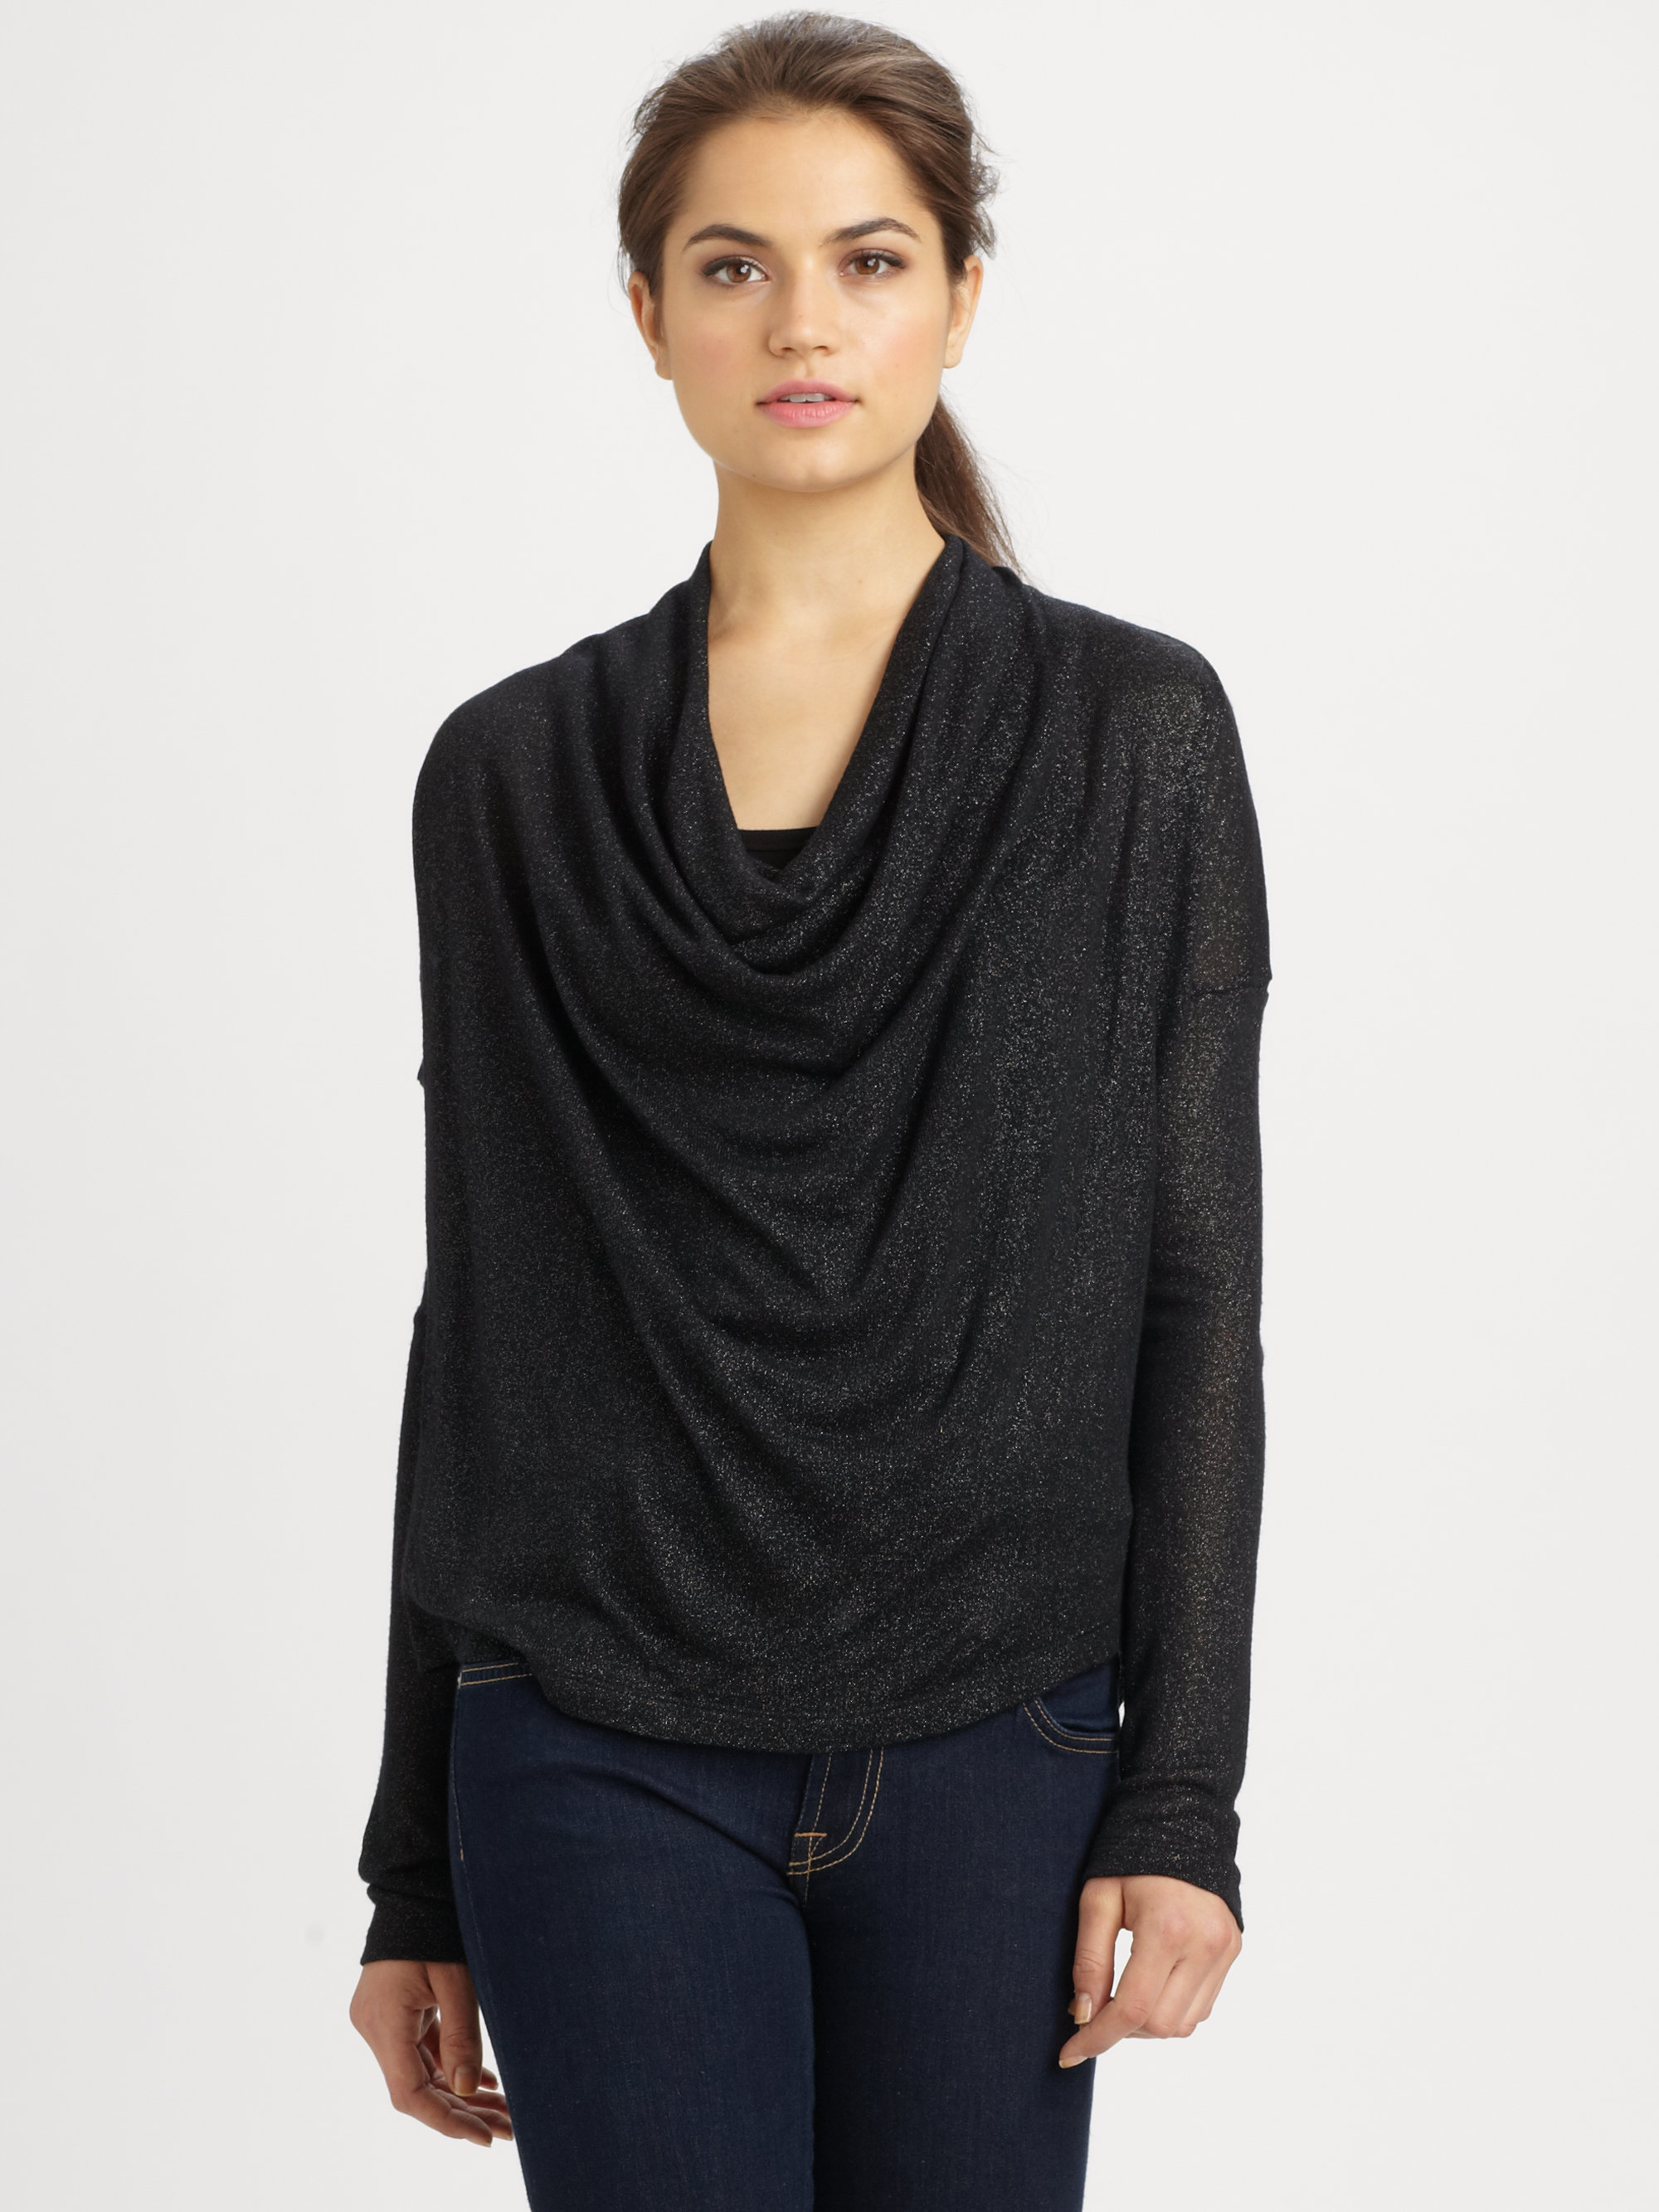 Splendid Sparkle Cowlneck Sweater in Black | Lyst